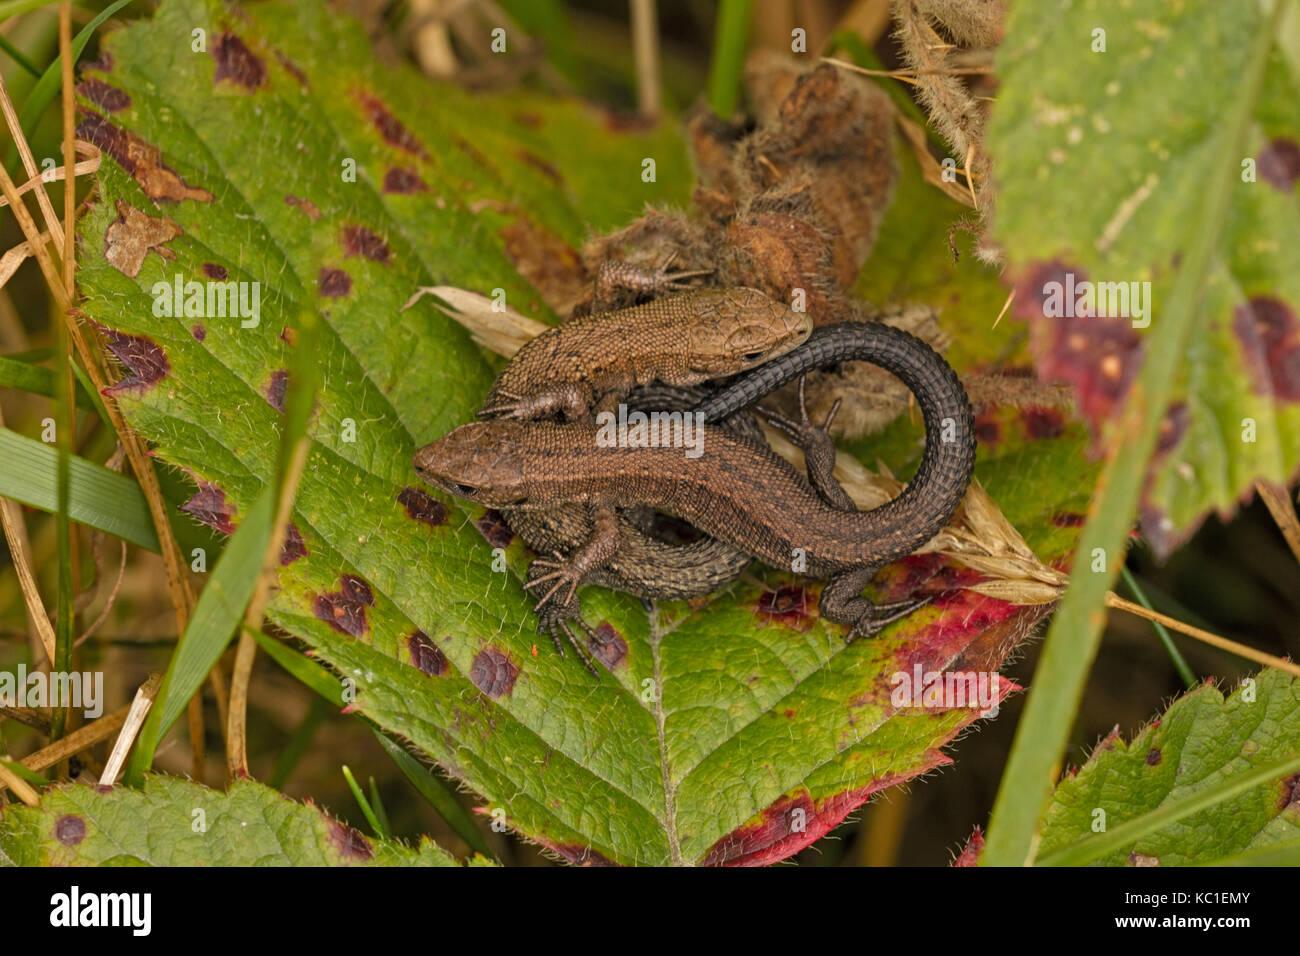 Common lizard (Lacerta vivipara), two young basking, Herefordshire, England, UK - Stock Image